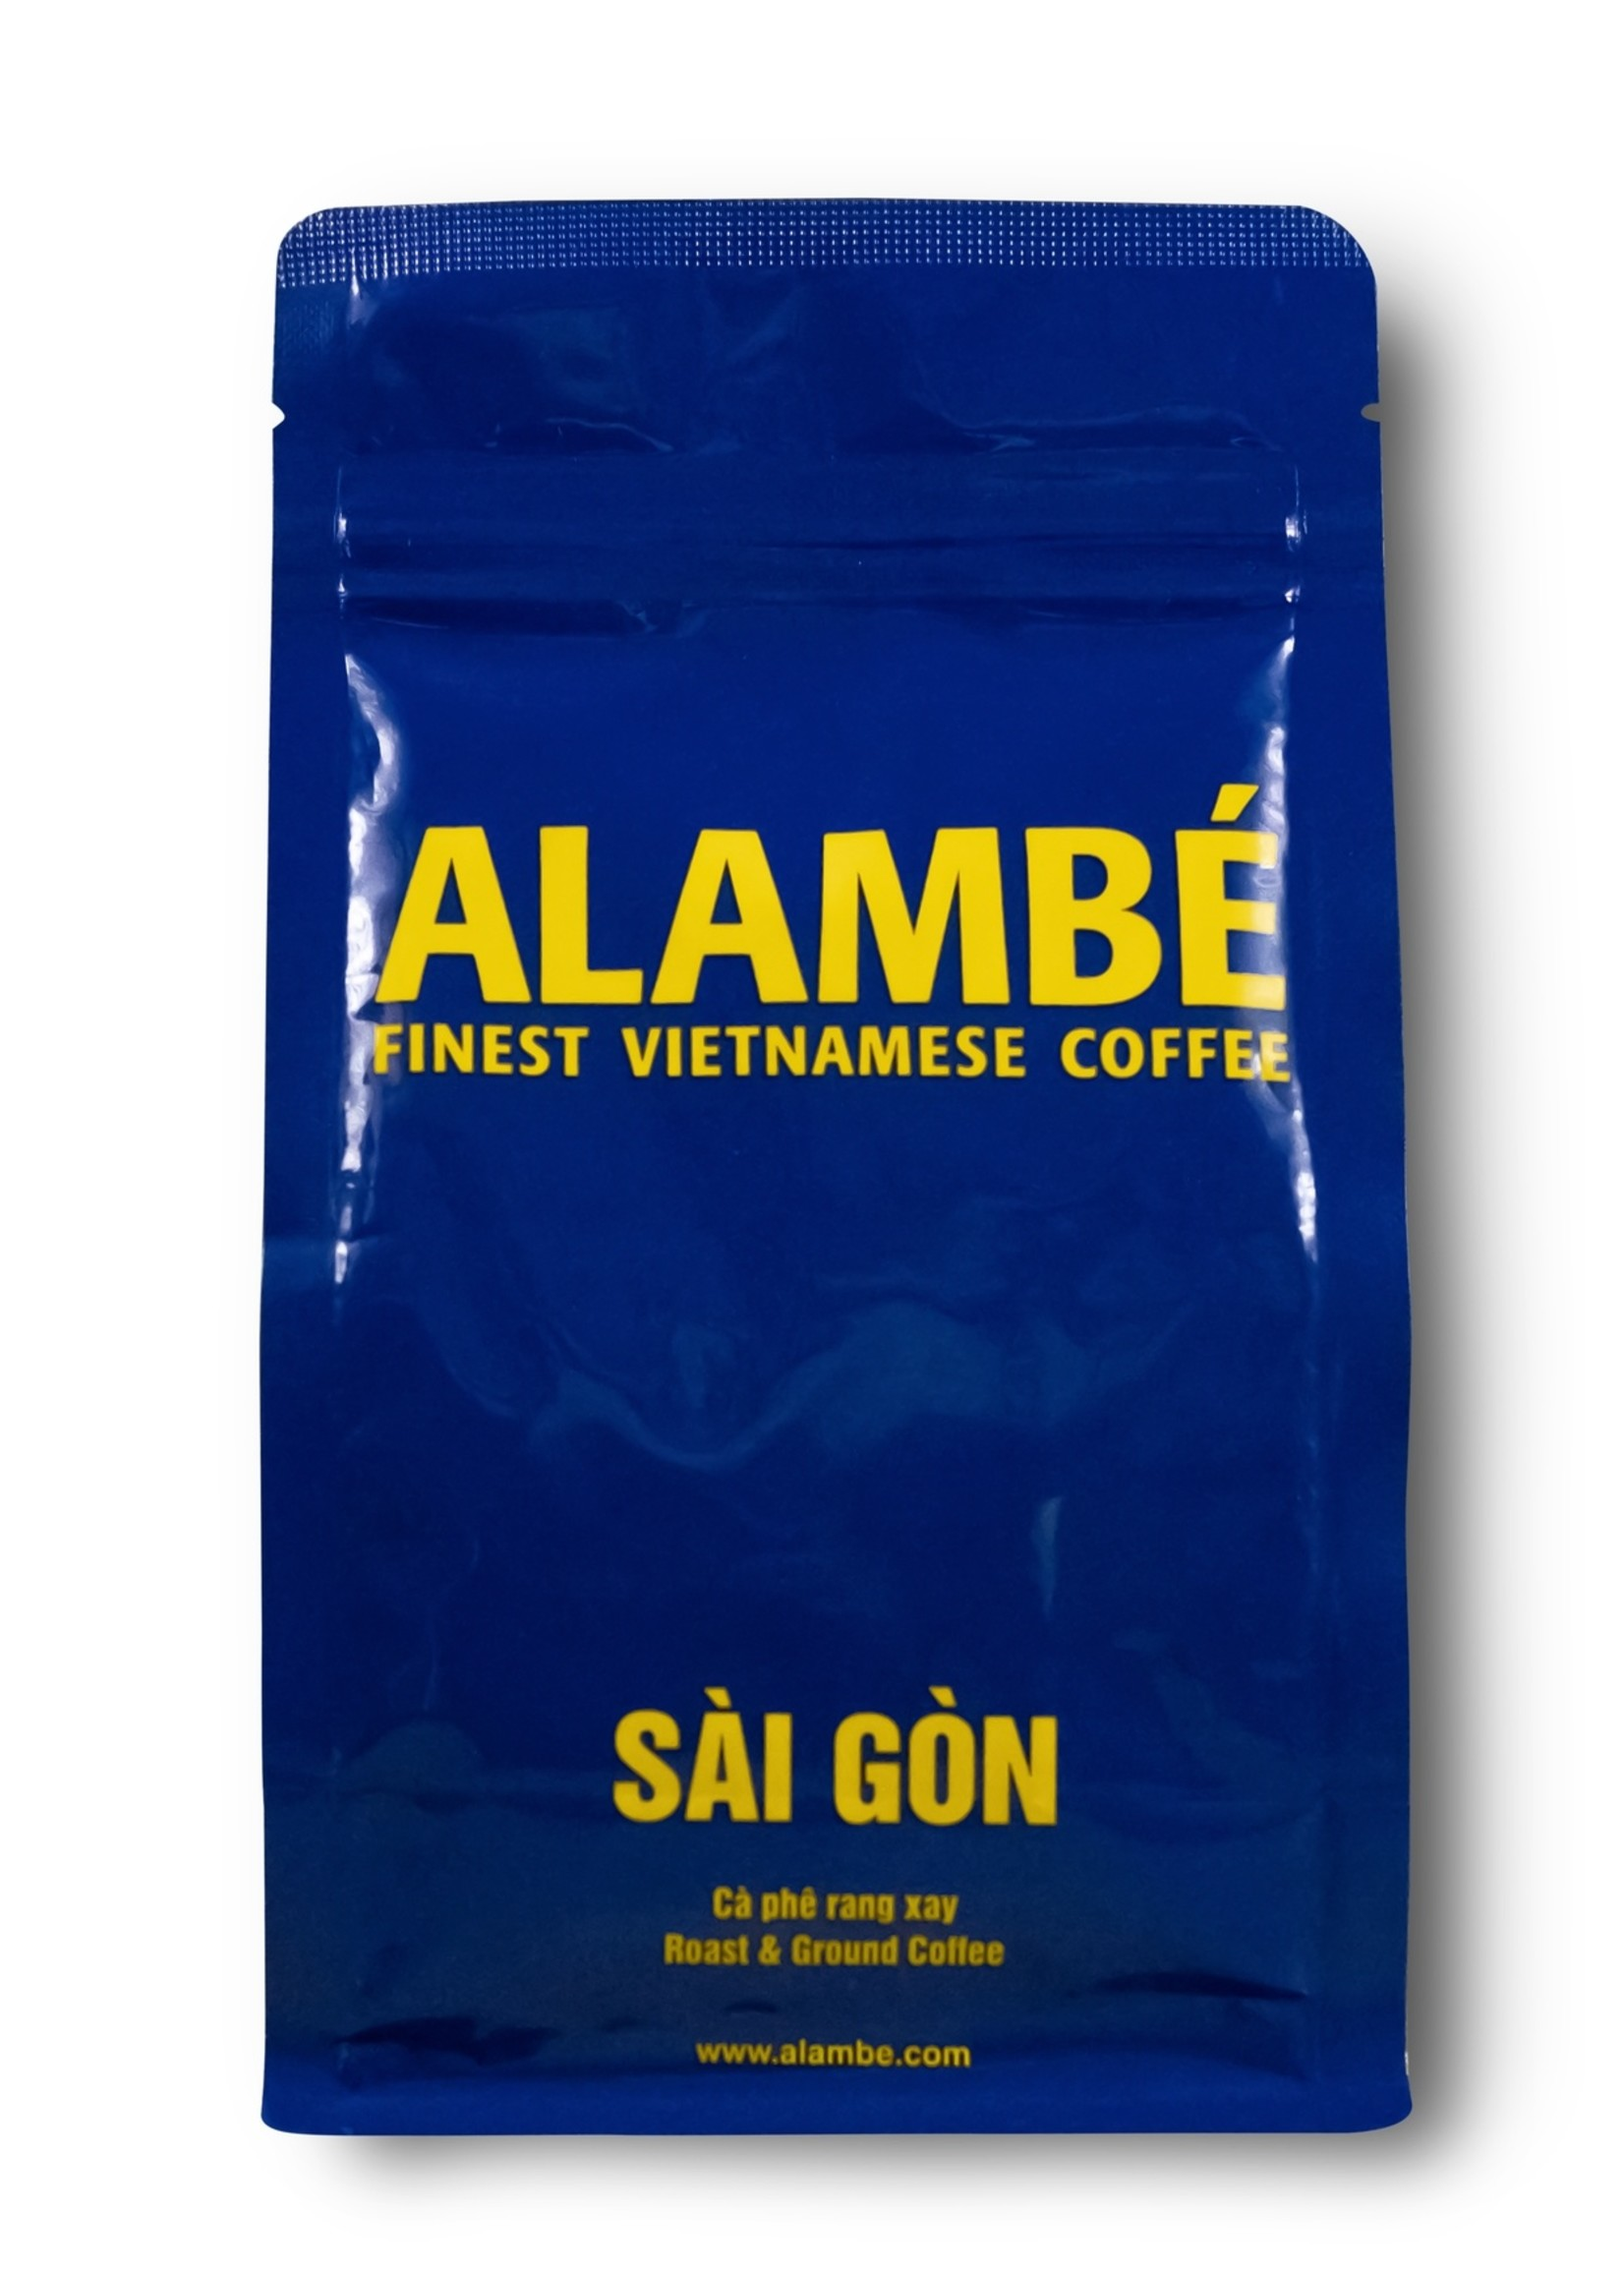 Alambé - Finest Vietnamese Coffee Sai Gon - Vietnamese style house blend (230g ground)